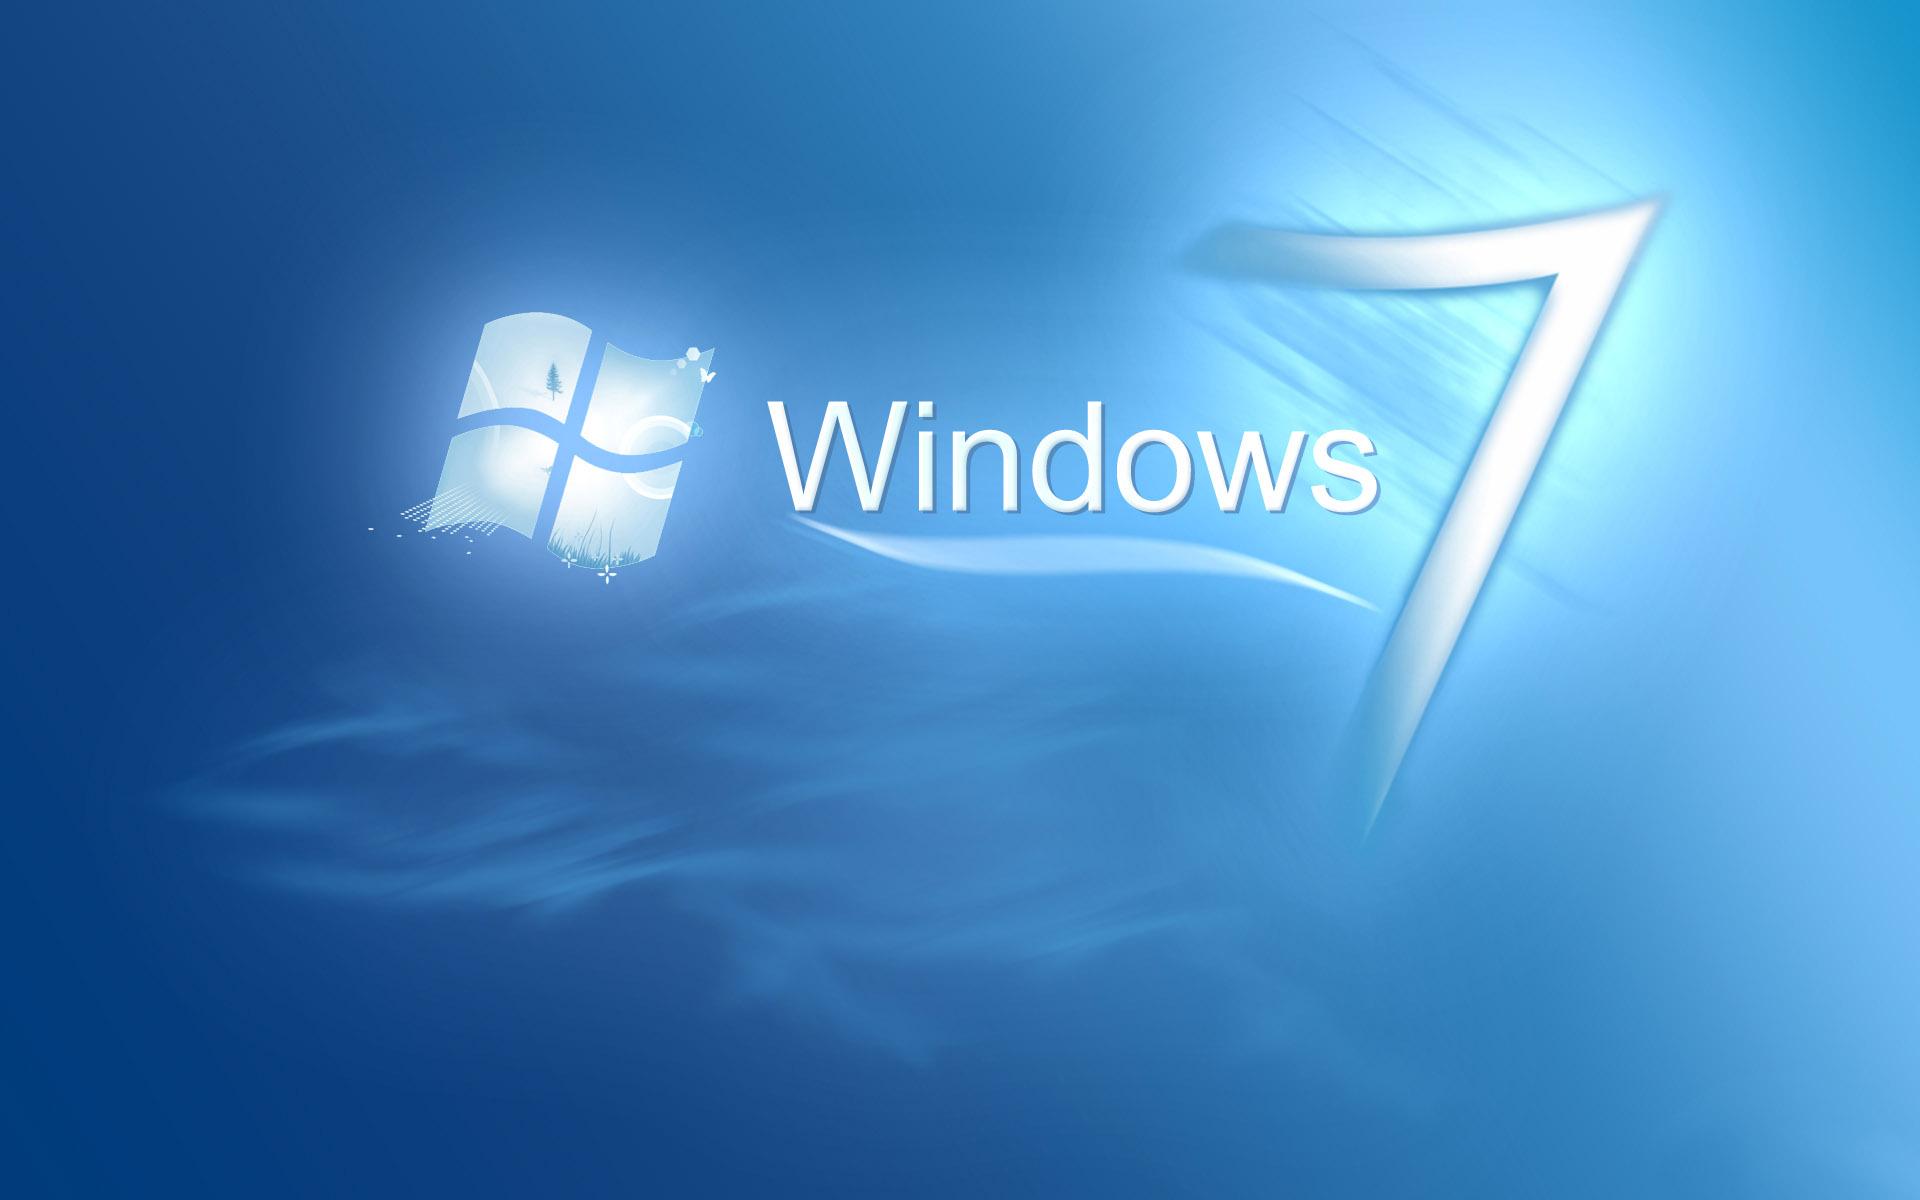 Windows 7 Whacked Wallpaper: ТОП-3 способа, Как установить драйвера на Windows 7?